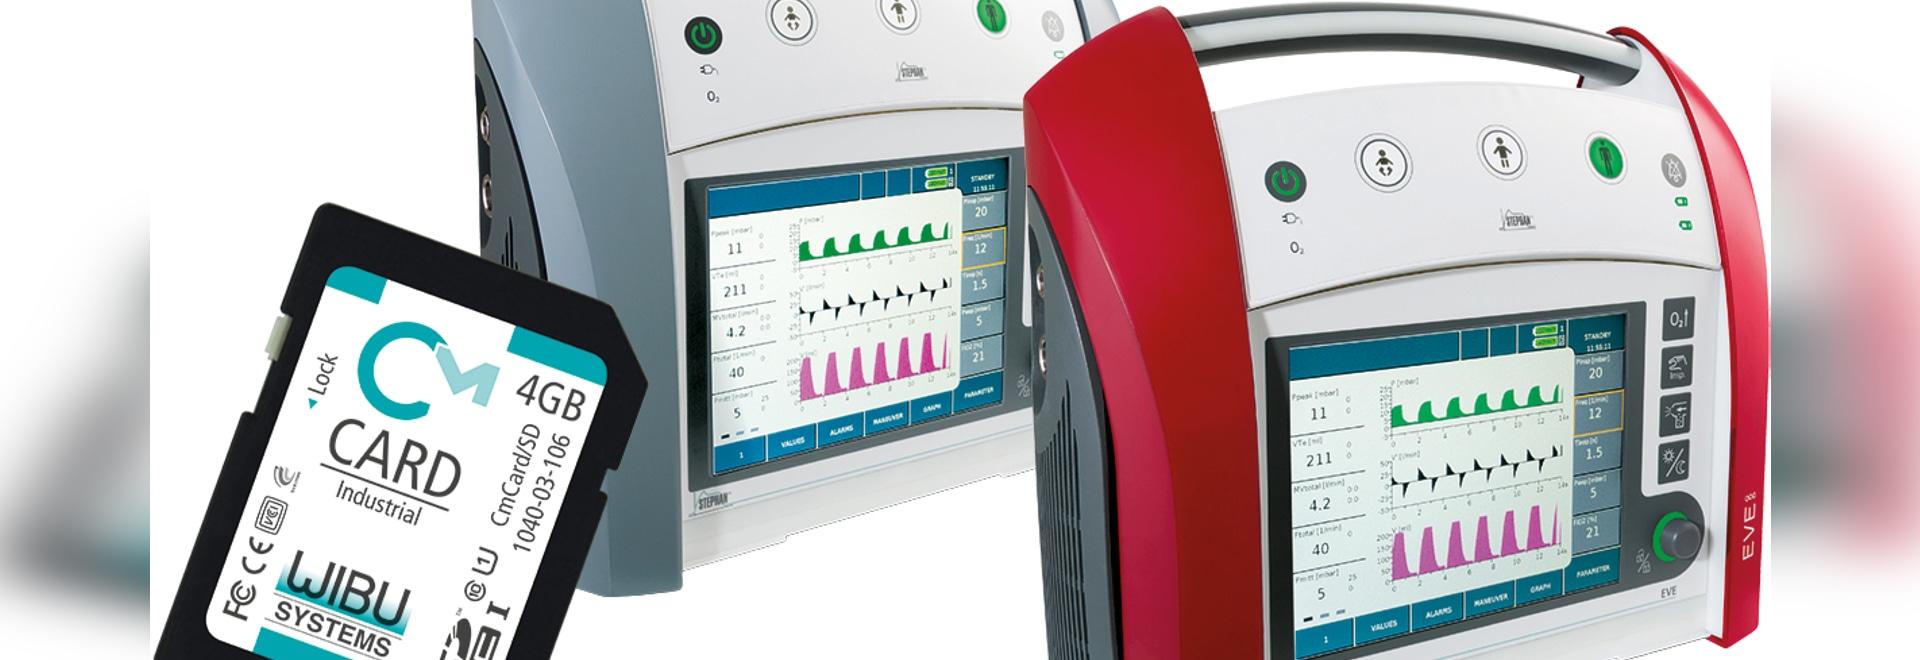 CodeMeter de Wibu Systems para dispositivos médicos